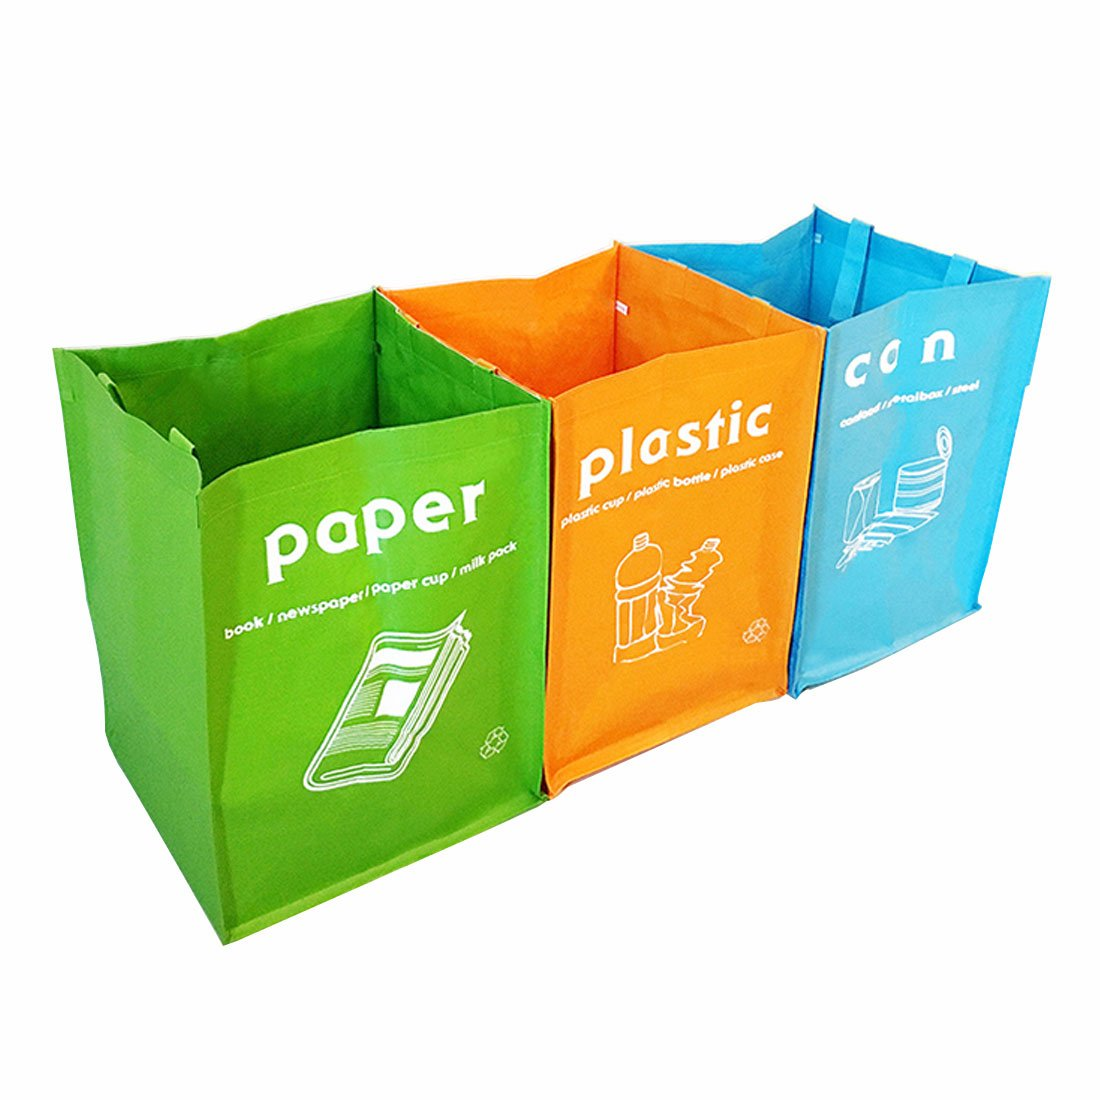 Waterproof Separate Recycle Bag Waste Baskets 3 Set(3 Colors) GARASANI